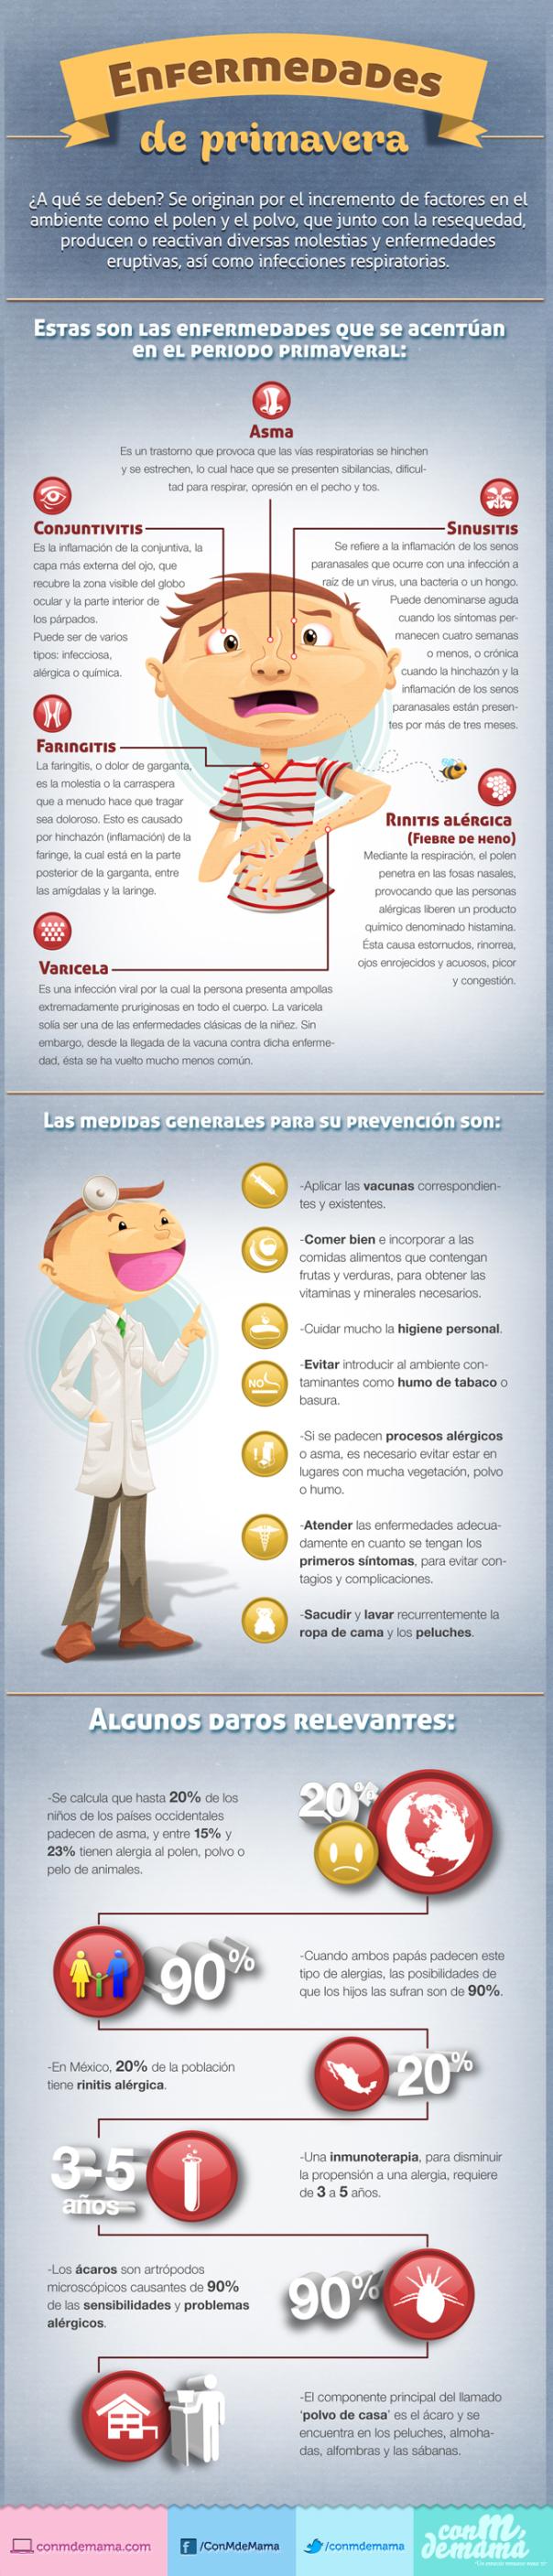 Enfermedades cardiovasculares #infografia #infographic #health